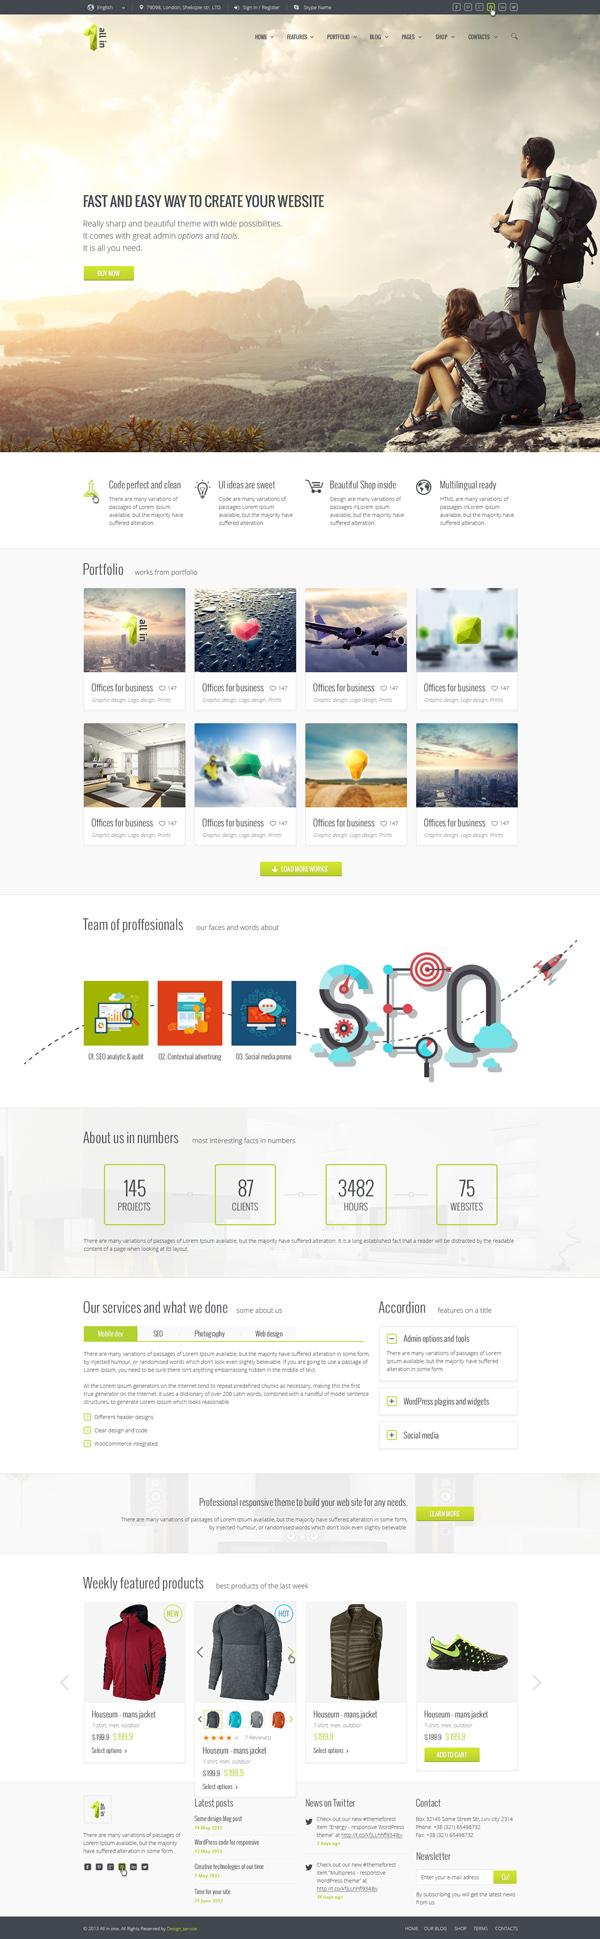 All in 1 - PSD HTML5 Template Multi-Purpose Business